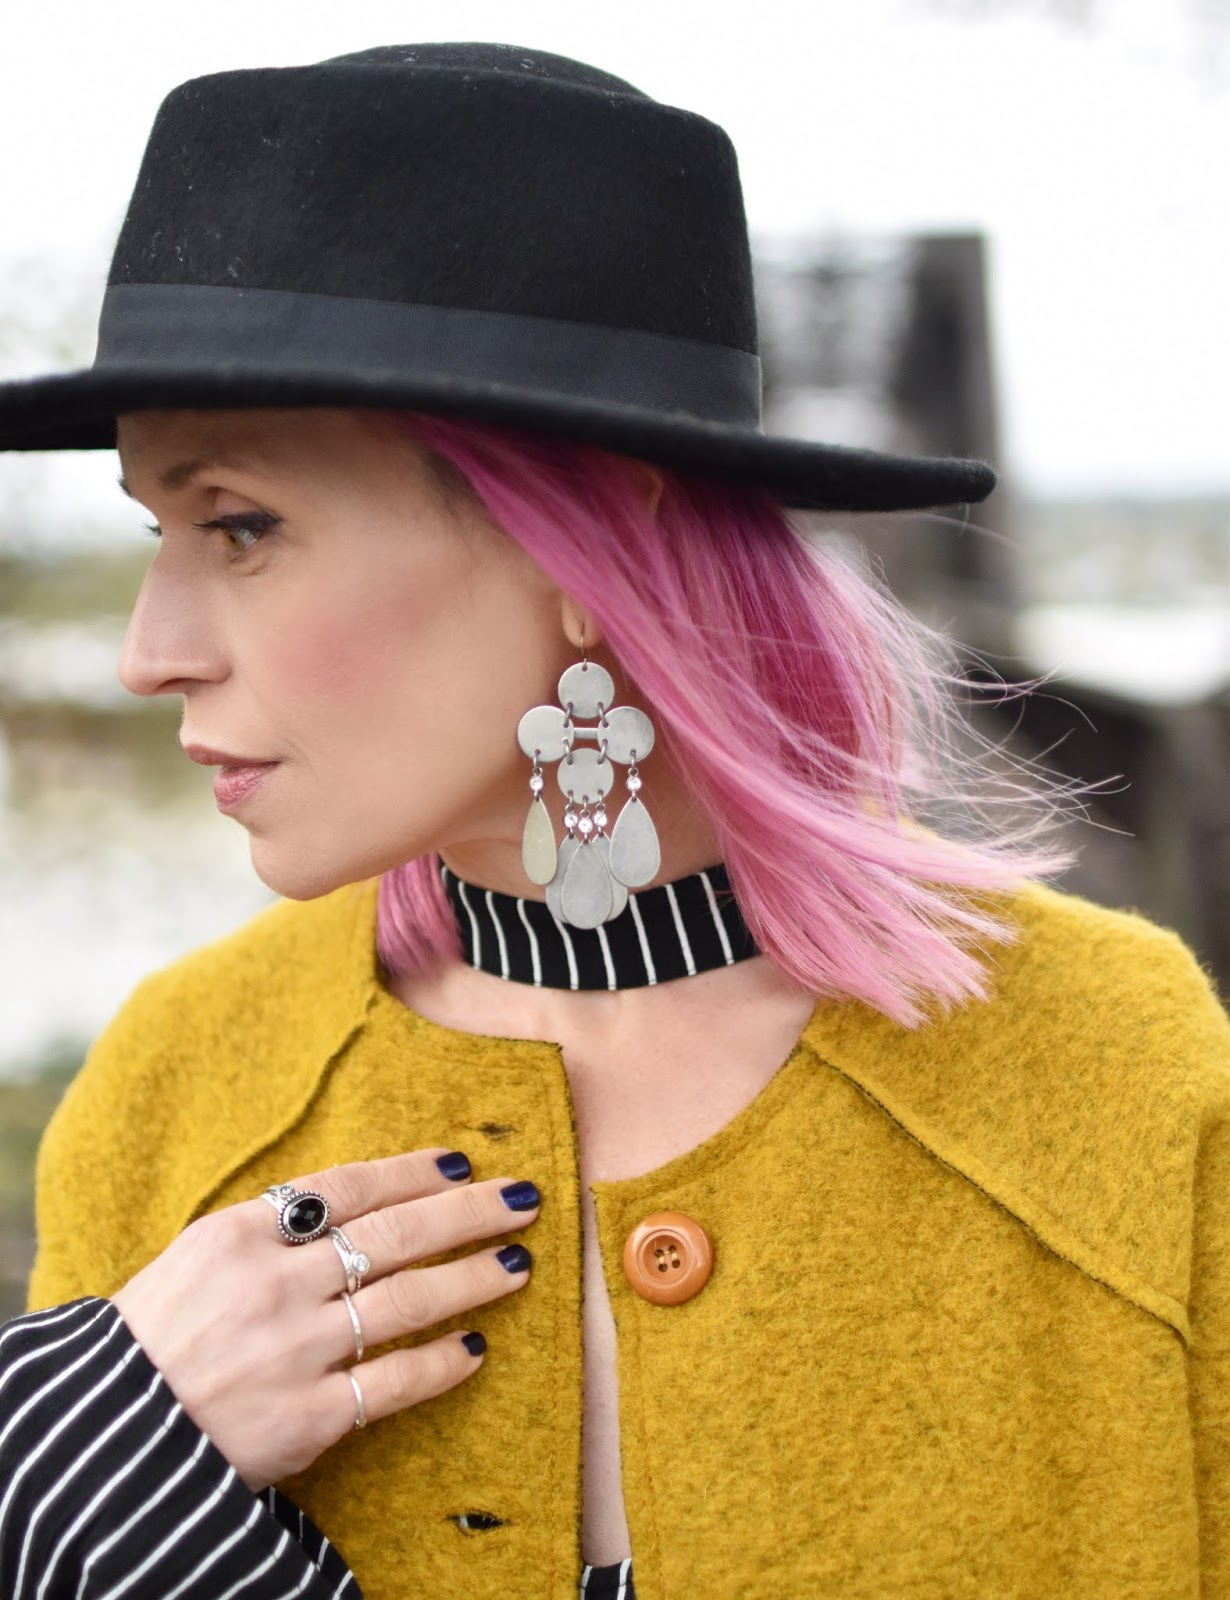 Monika Faulkner outfit inspiration - mustard wool jacket, flat-top felt fedora, fuchsia hair